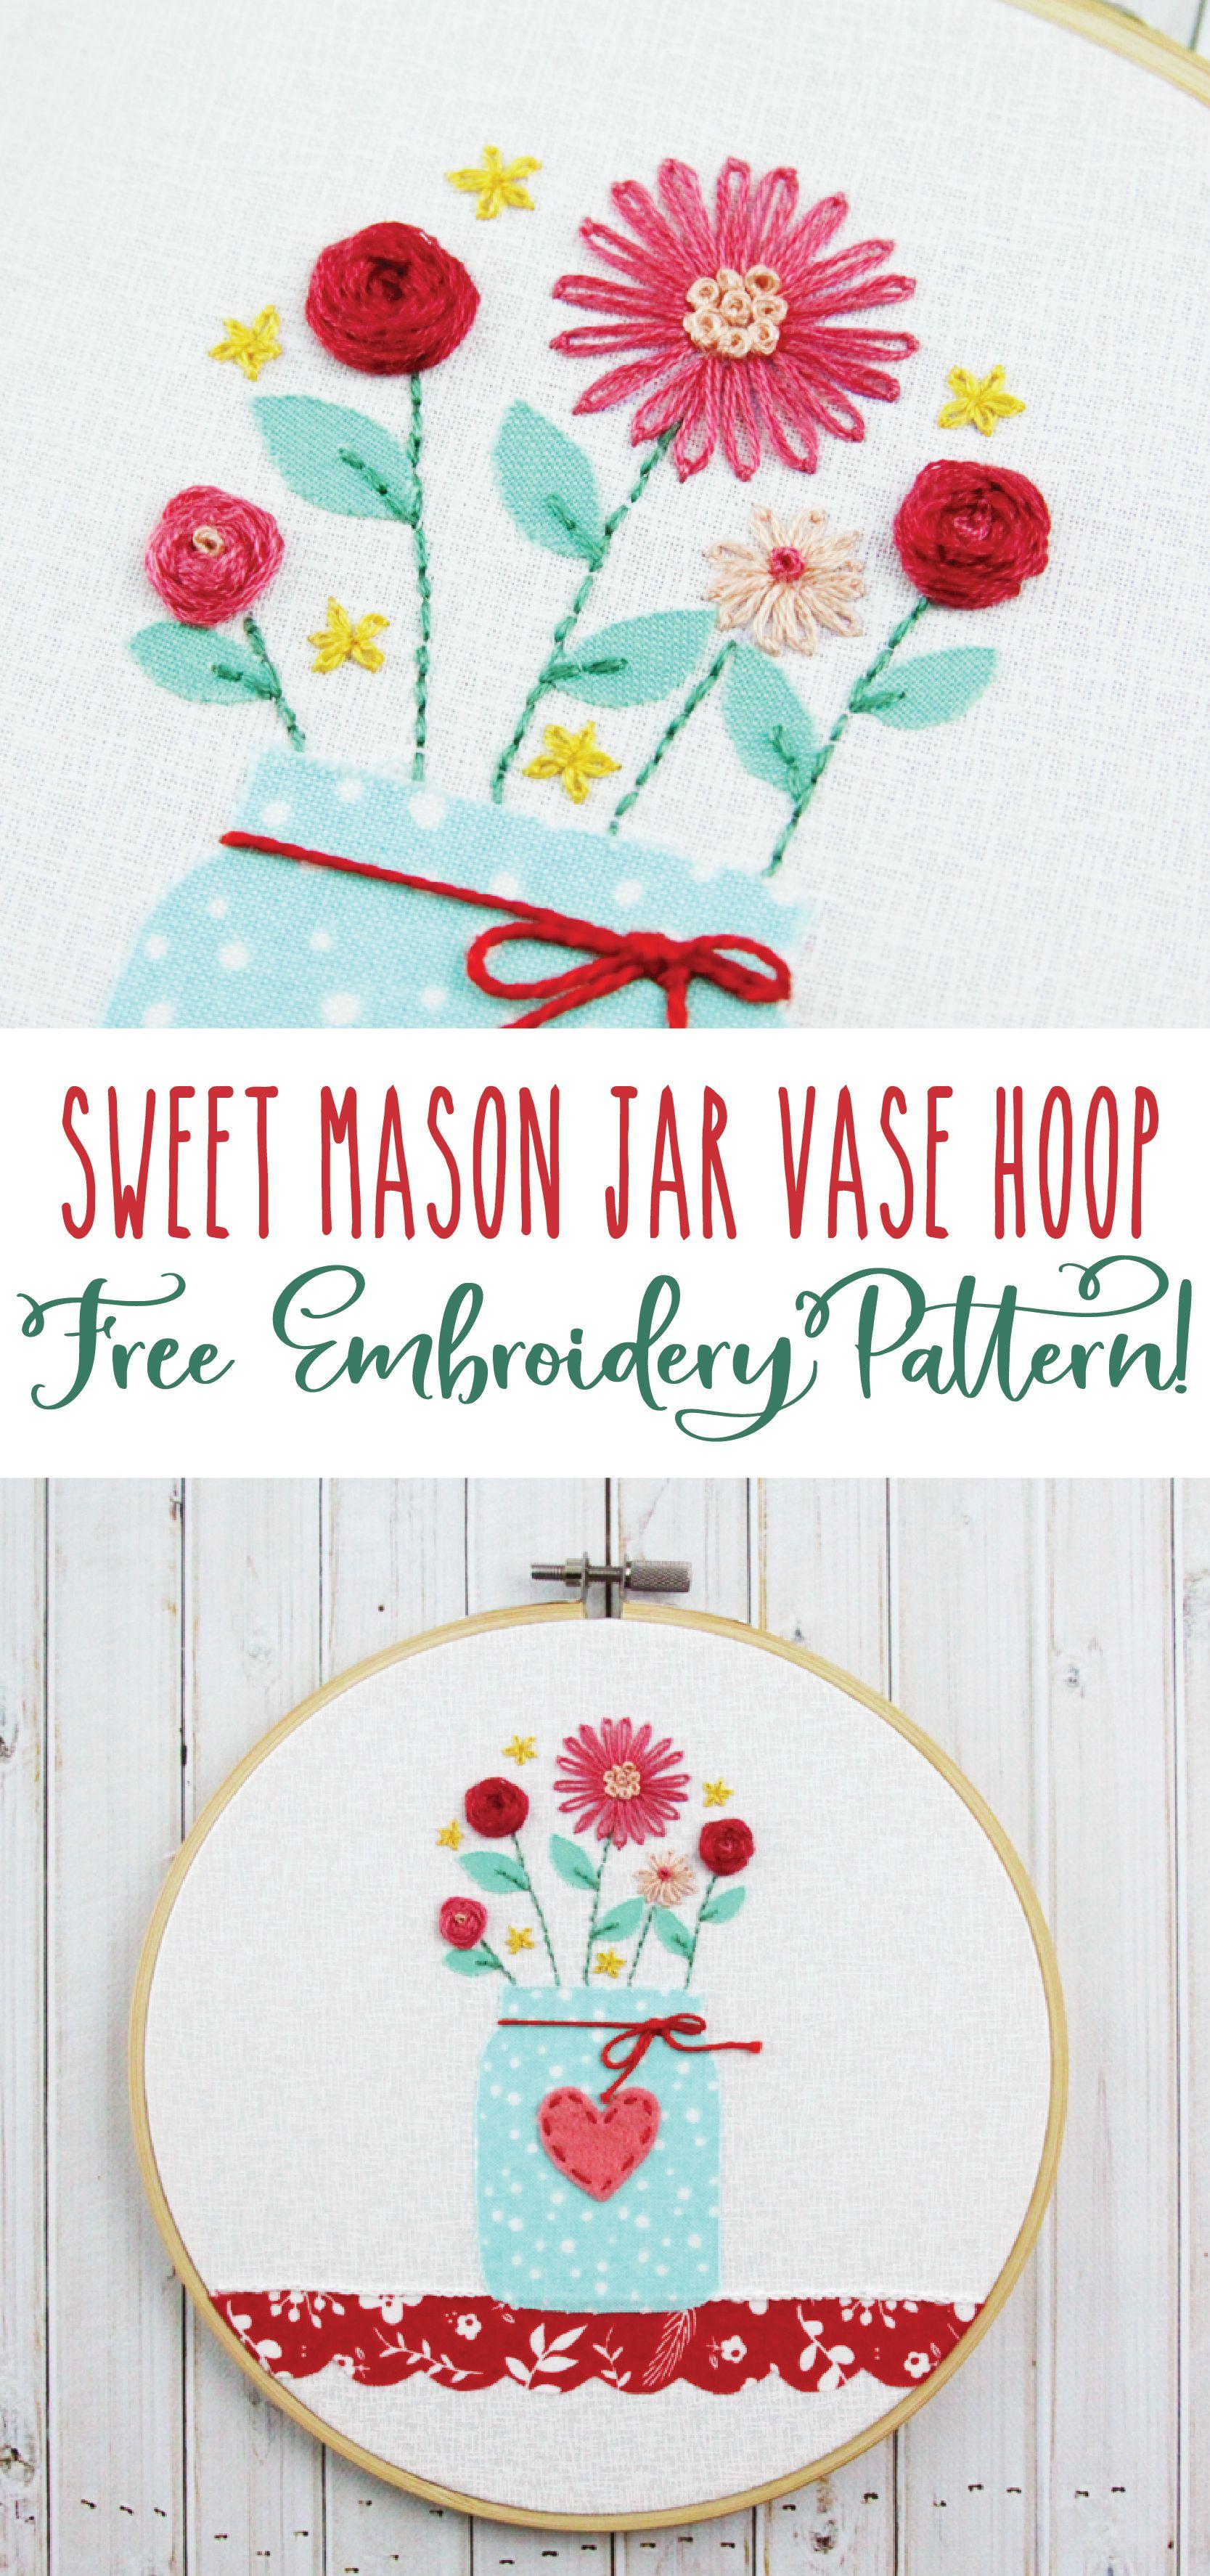 Sweet Mason Jar Vase Hoop - Free Embroidery Pattern! - | bordados ...